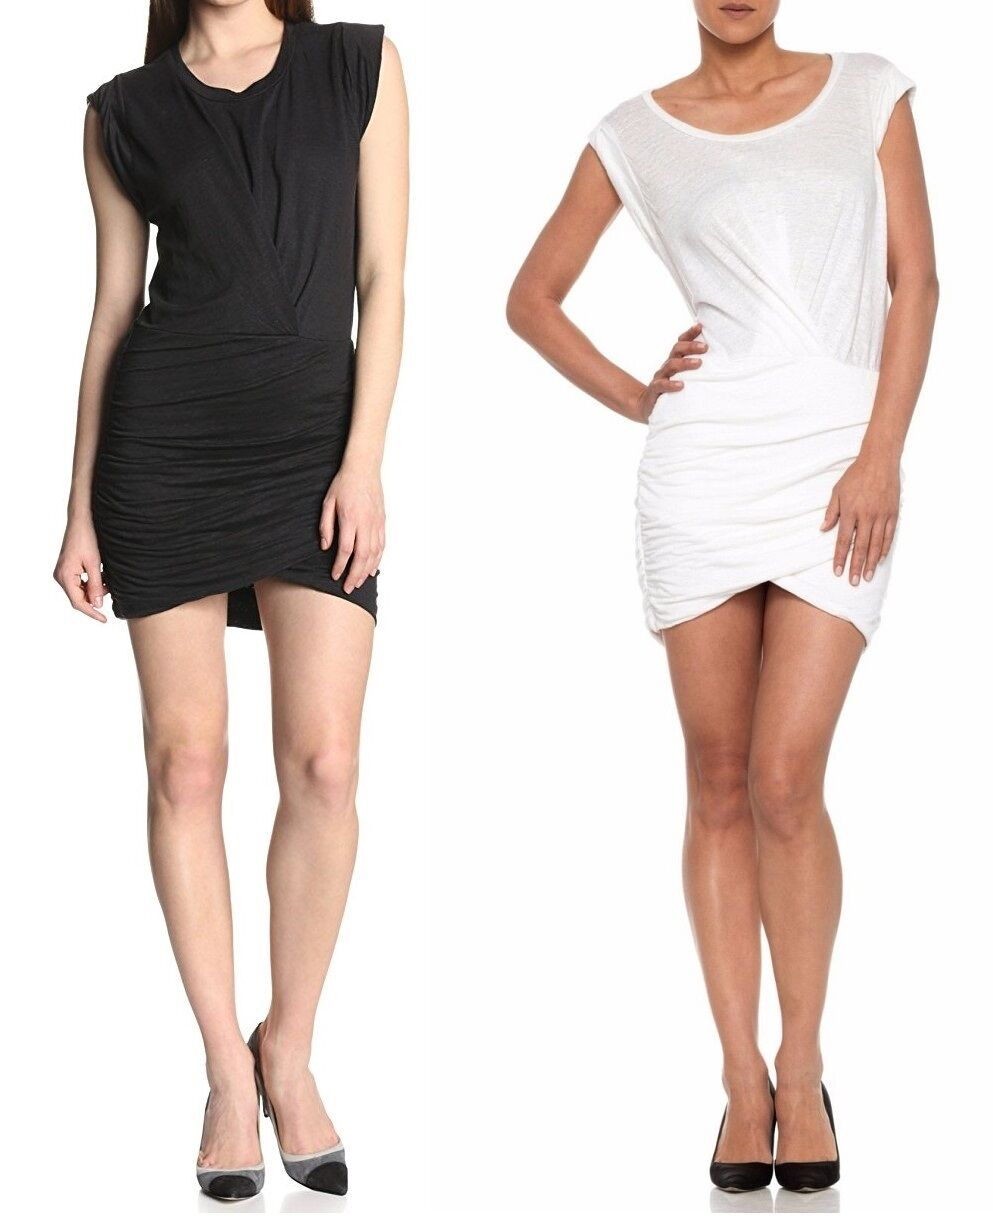 Joe's Jeans Mikaela Dress Stretch Linen Ruched Wrap Jersey Top XS S M L Nwt